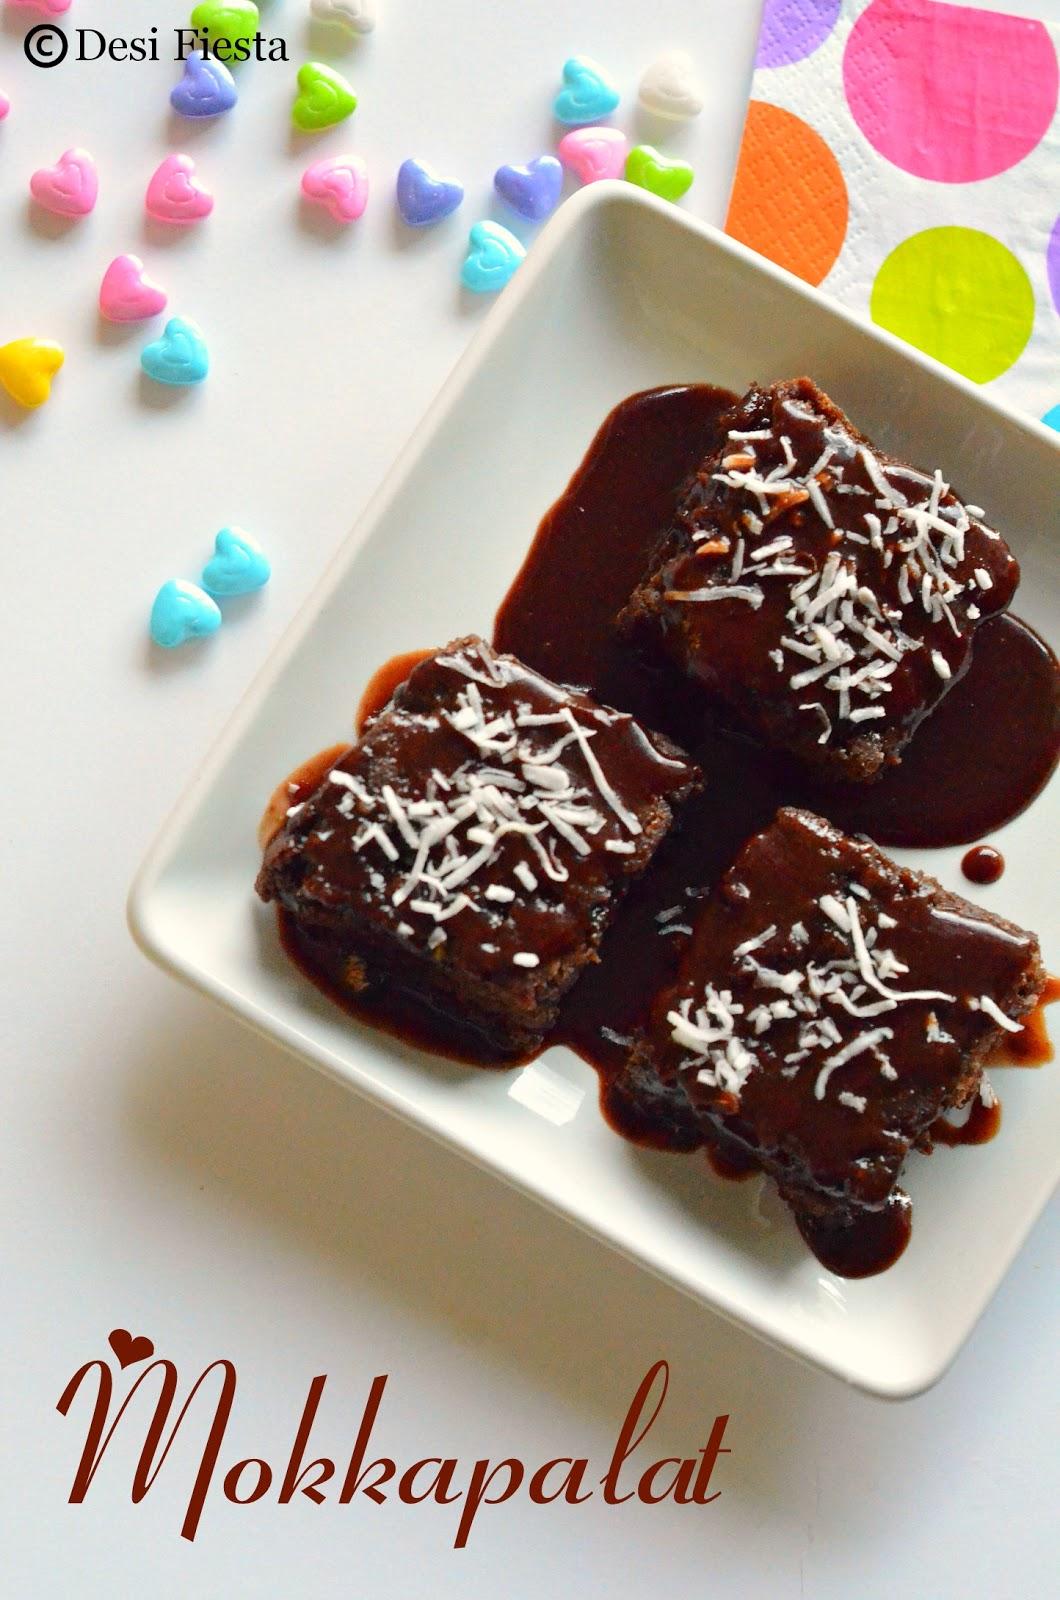 Chocolate brownie with chocolate icing